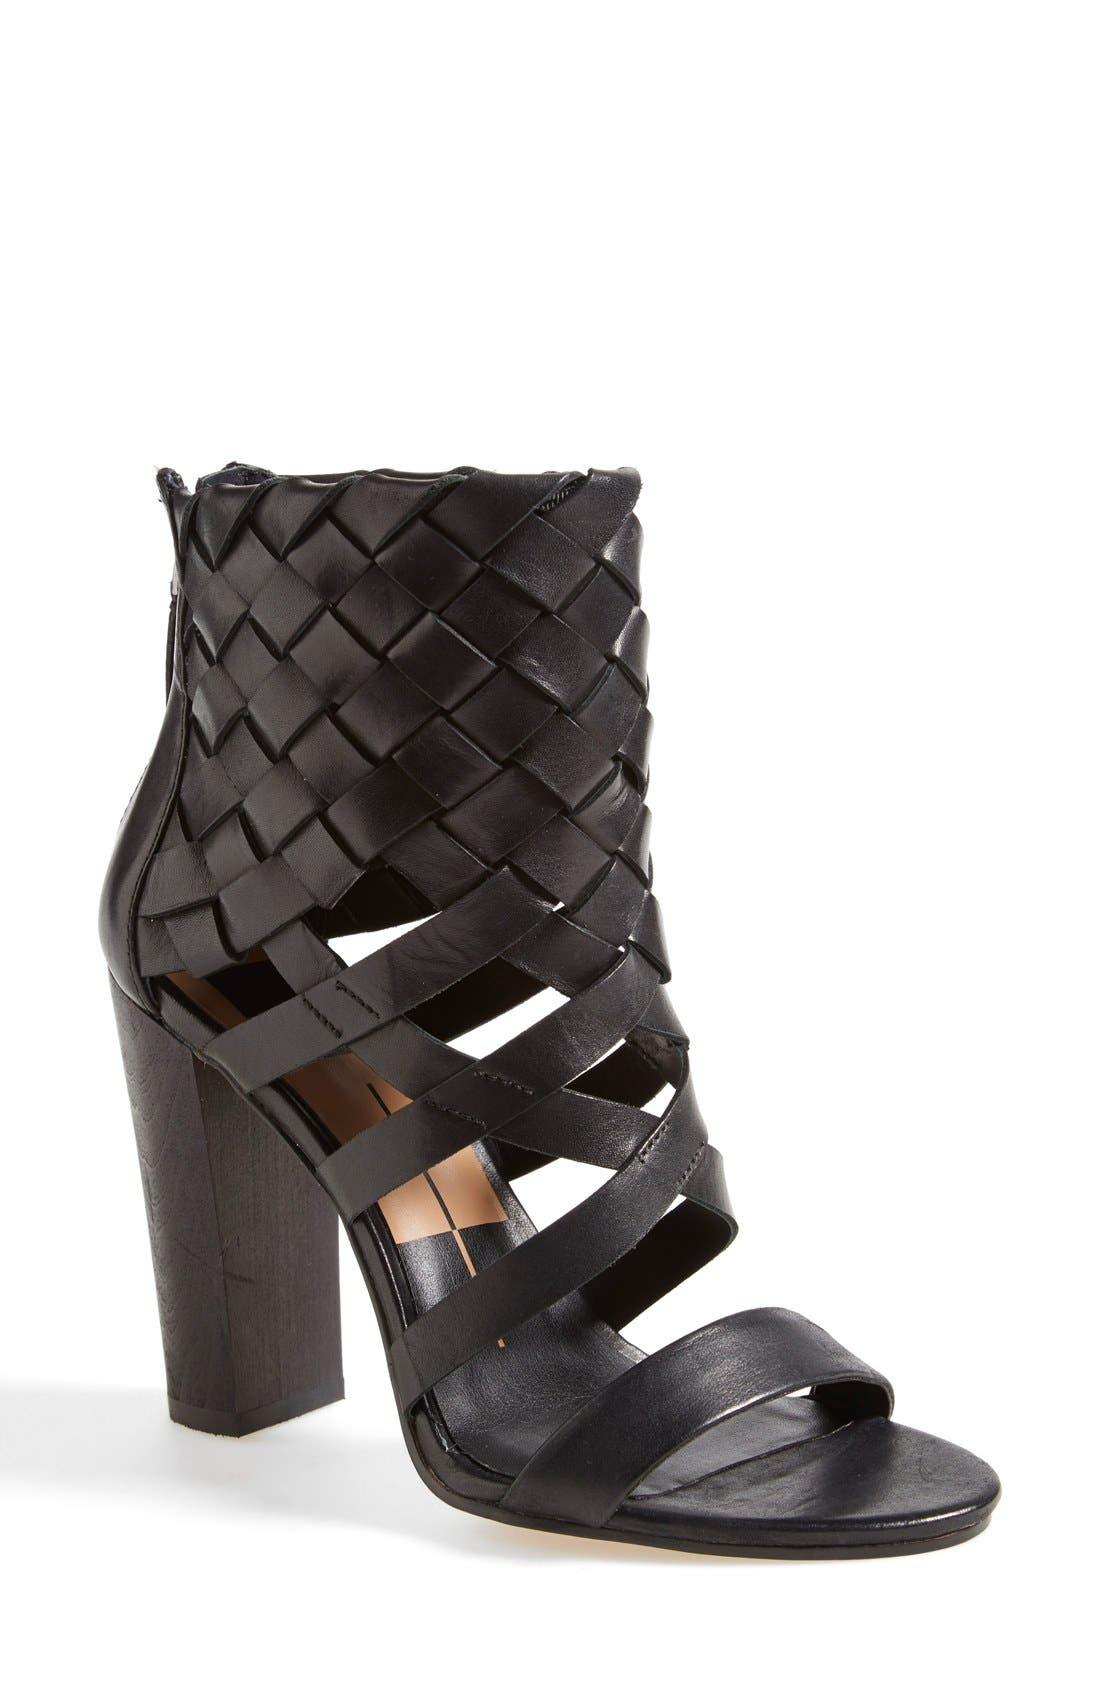 Alternate Image 1 Selected - Dolce Vita 'Nakita' Woven Leather Sandal